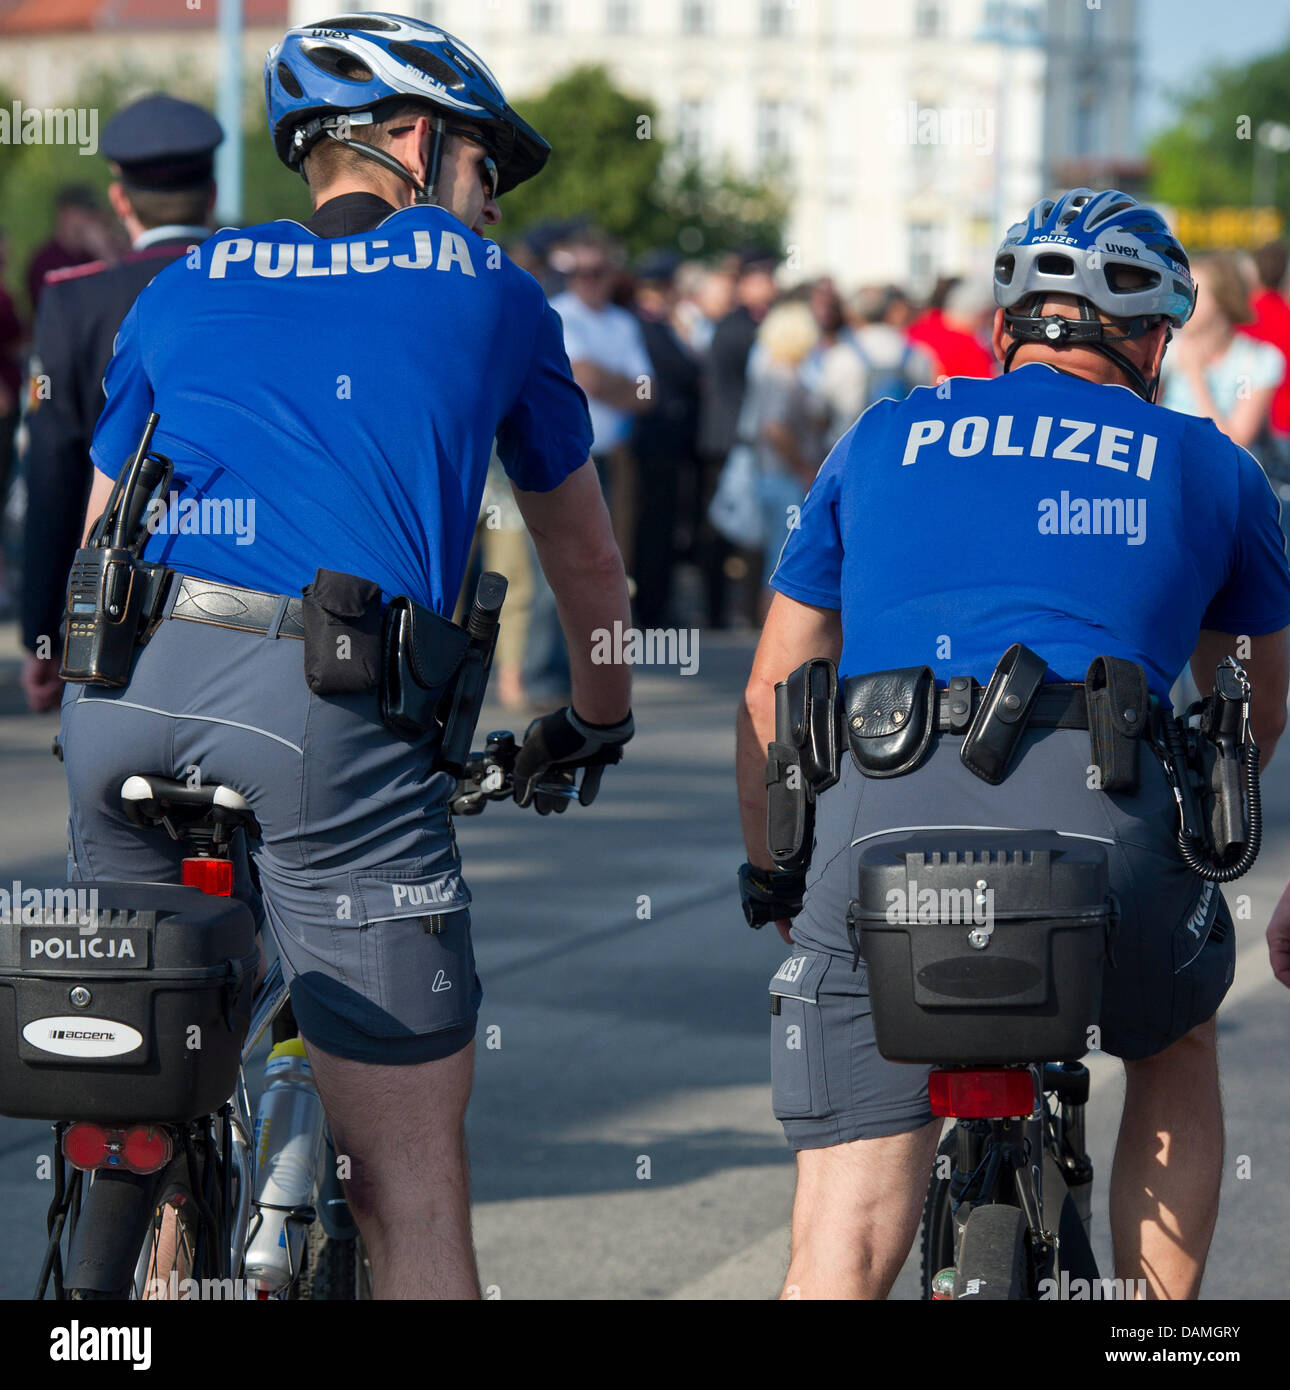 Polish National Police Update Armory - The Firearm BlogThe Firearm ...